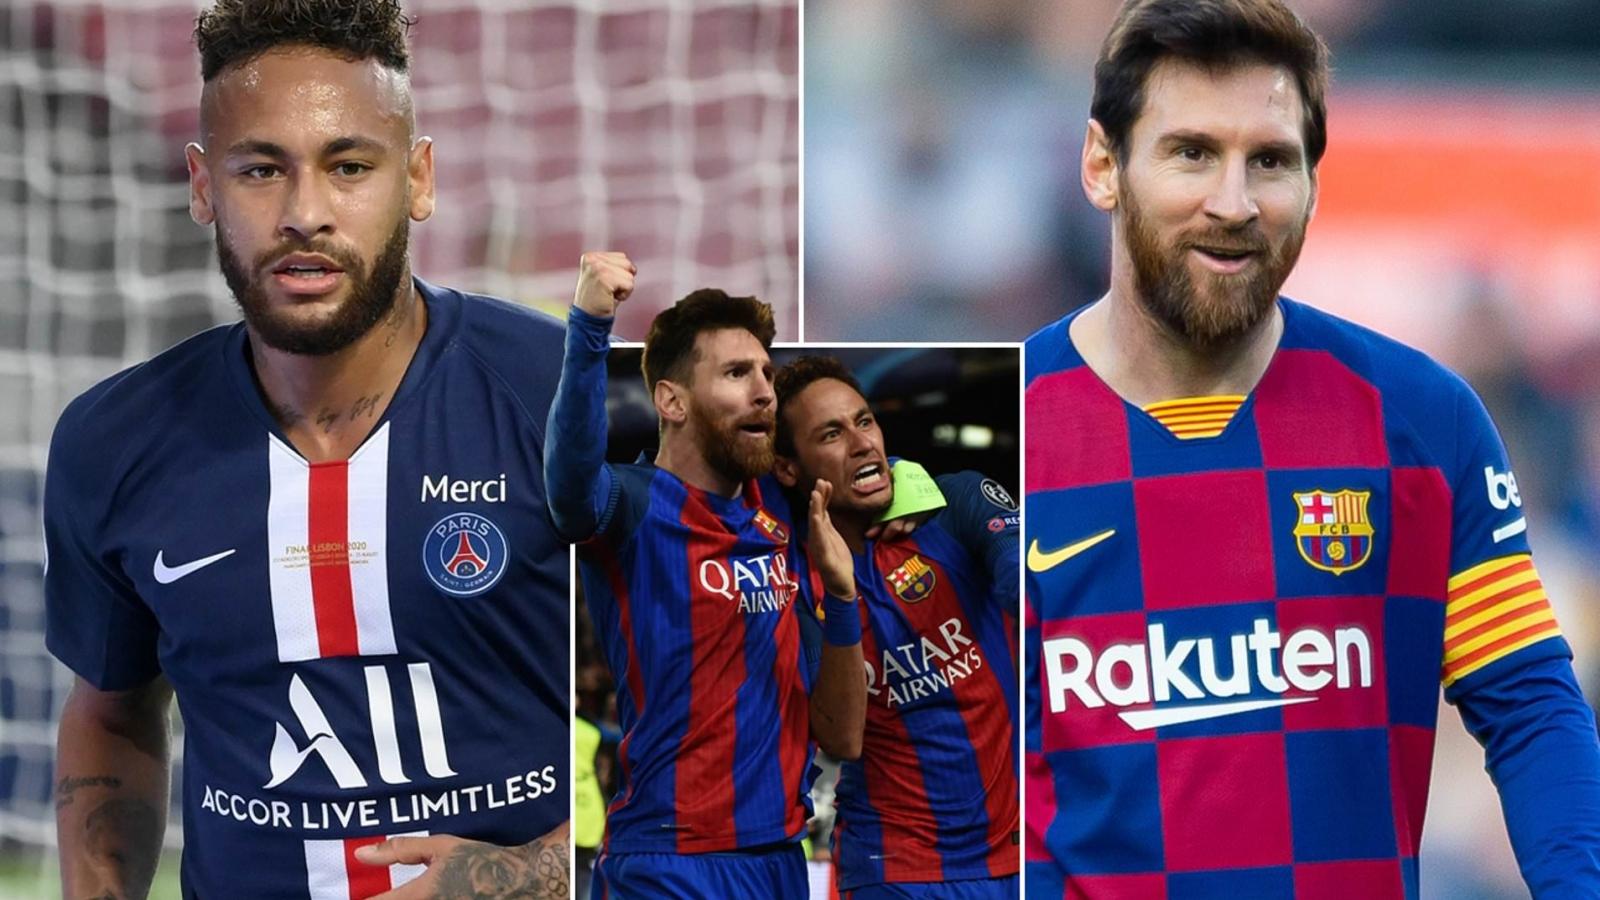 Neymar cam kết tương lai, mời gọi Lionel Messi tới PSG